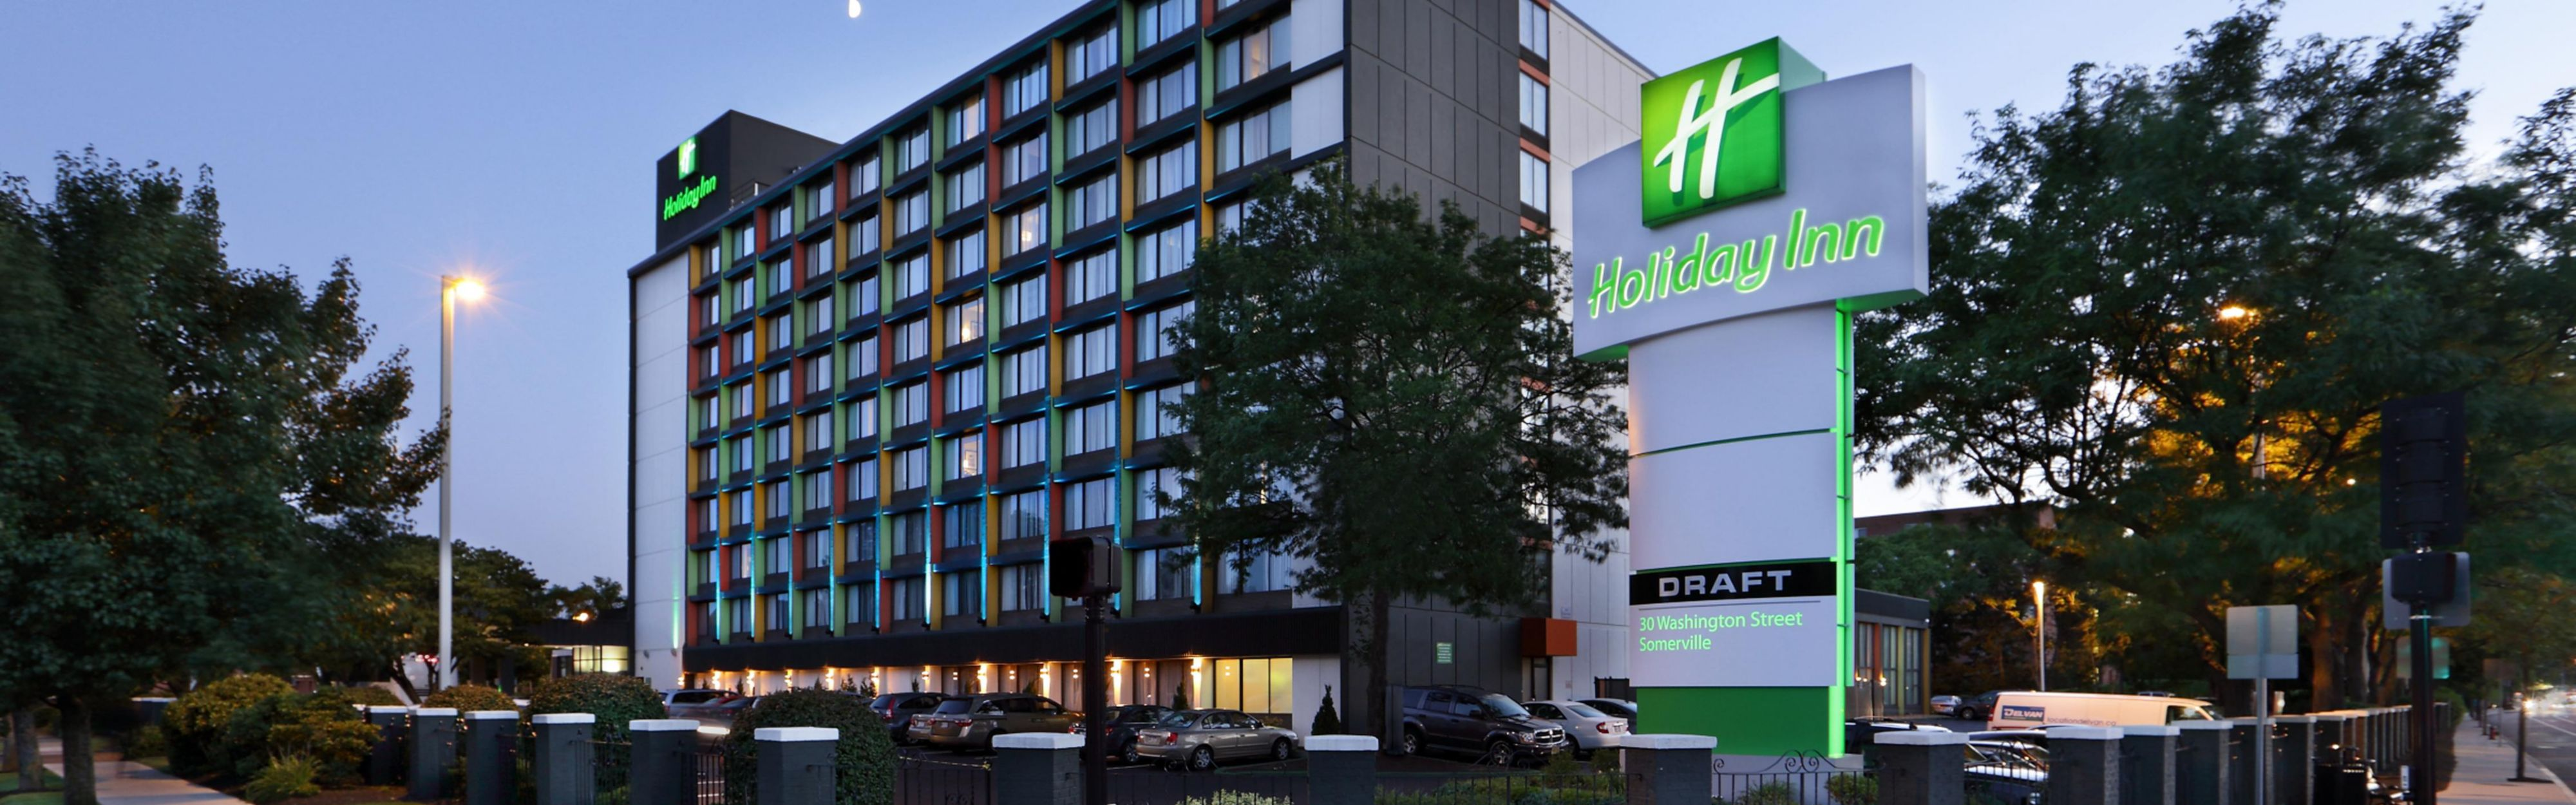 Holiday Inn Boston Bunker Hill Area image 0